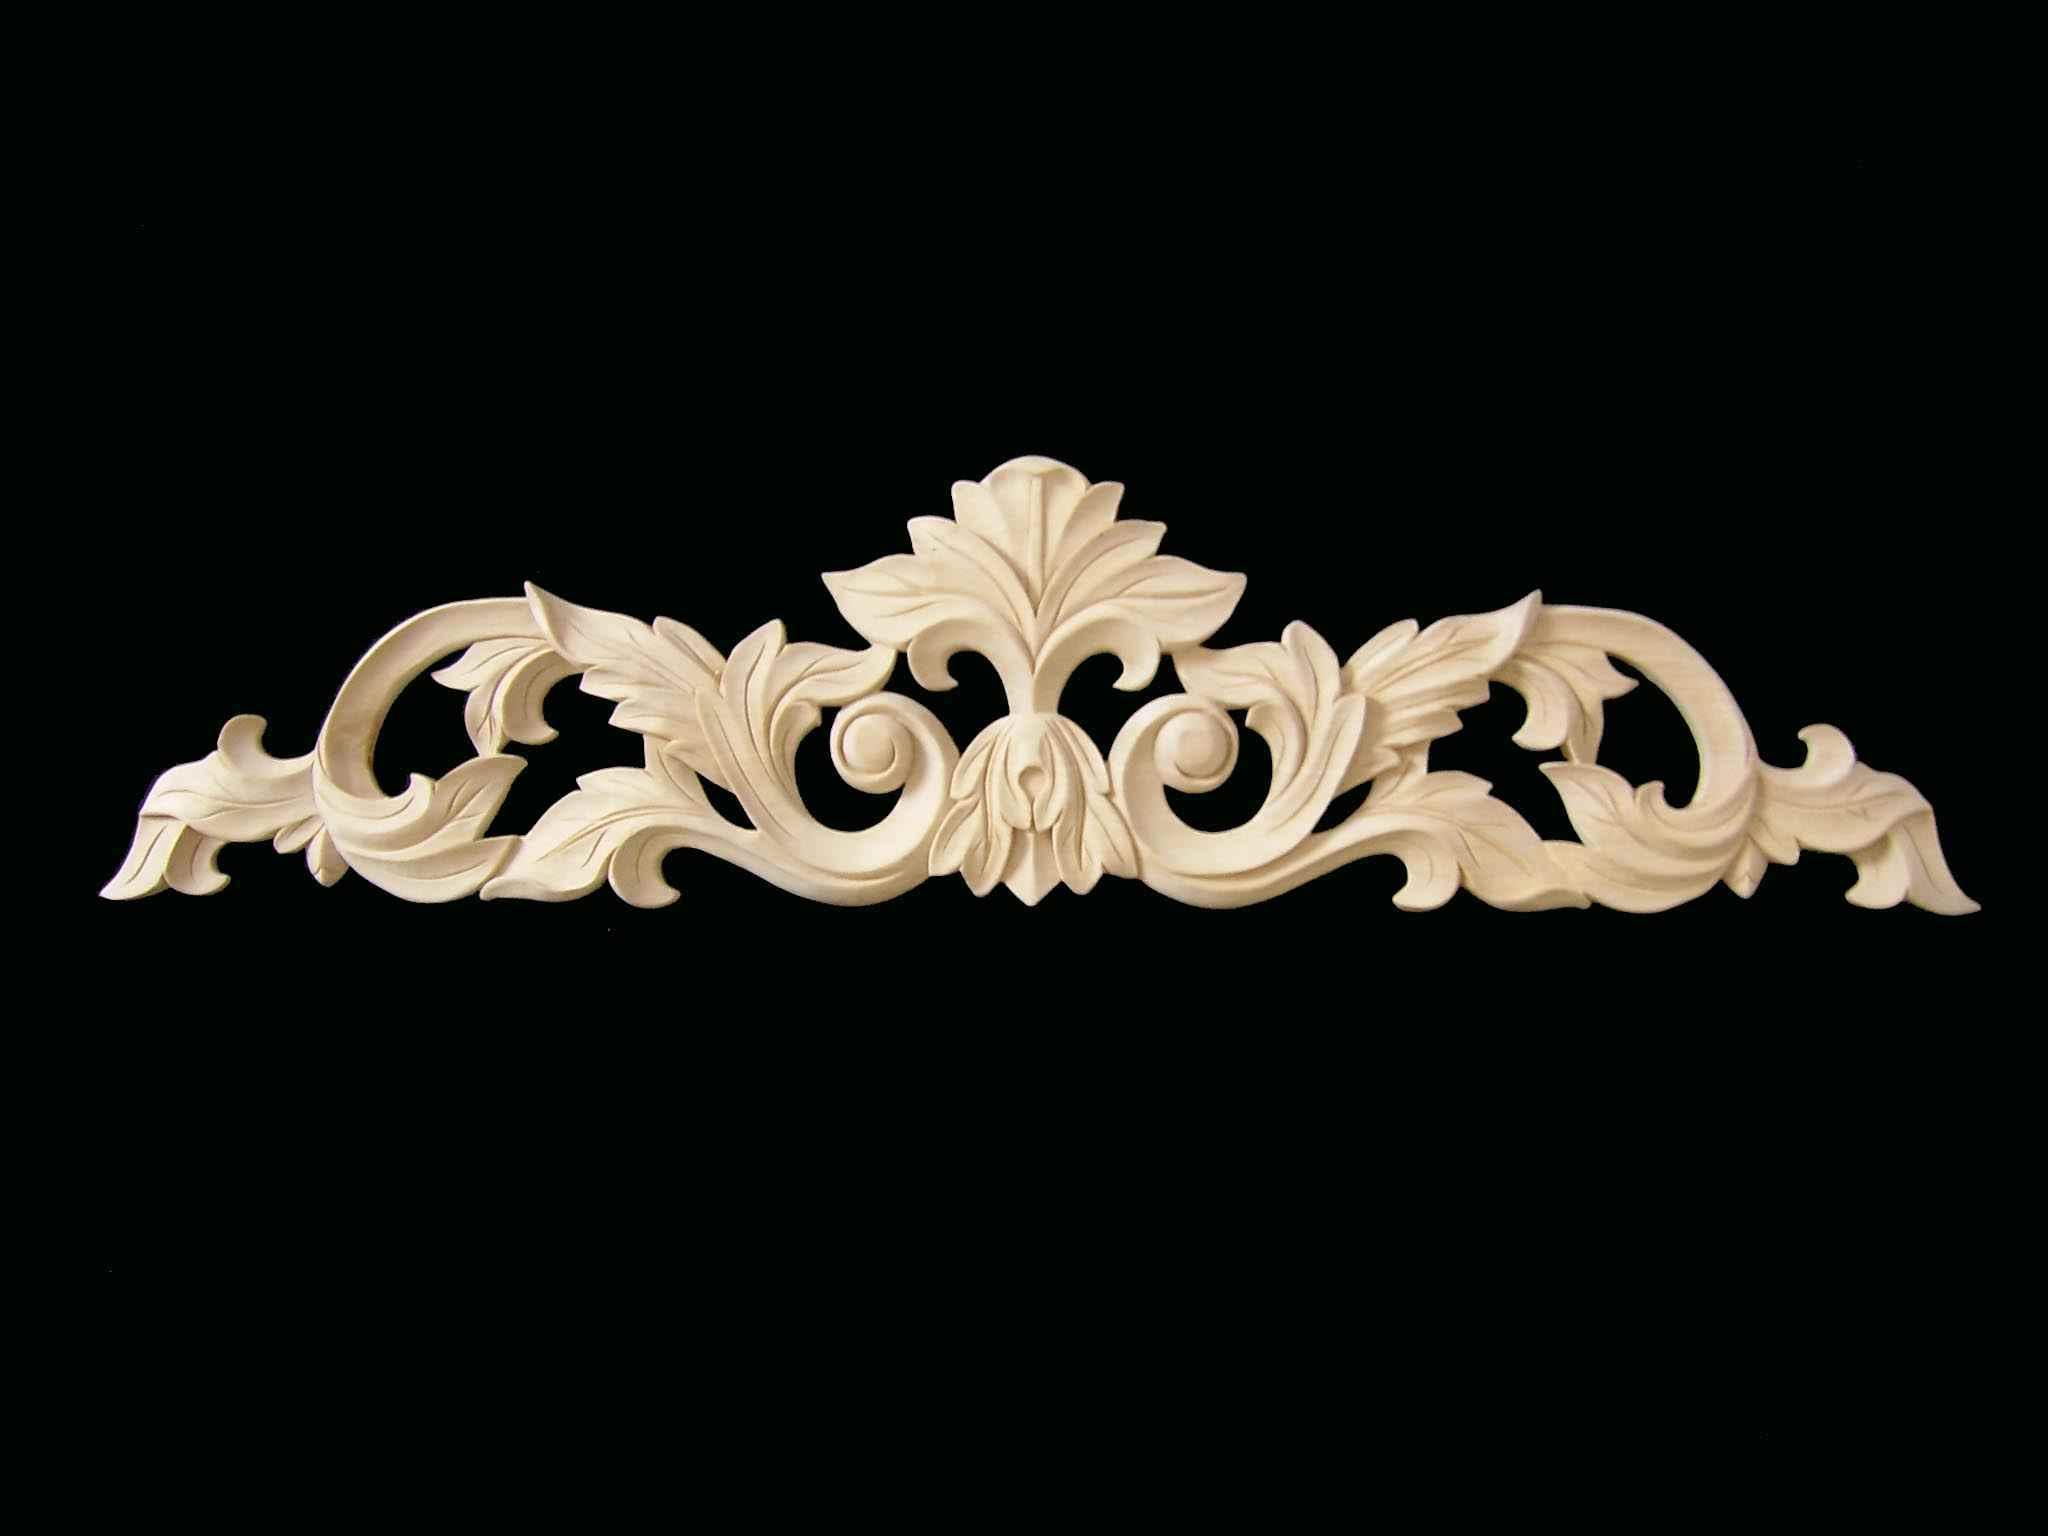 China wood onlay wr onlays wooden